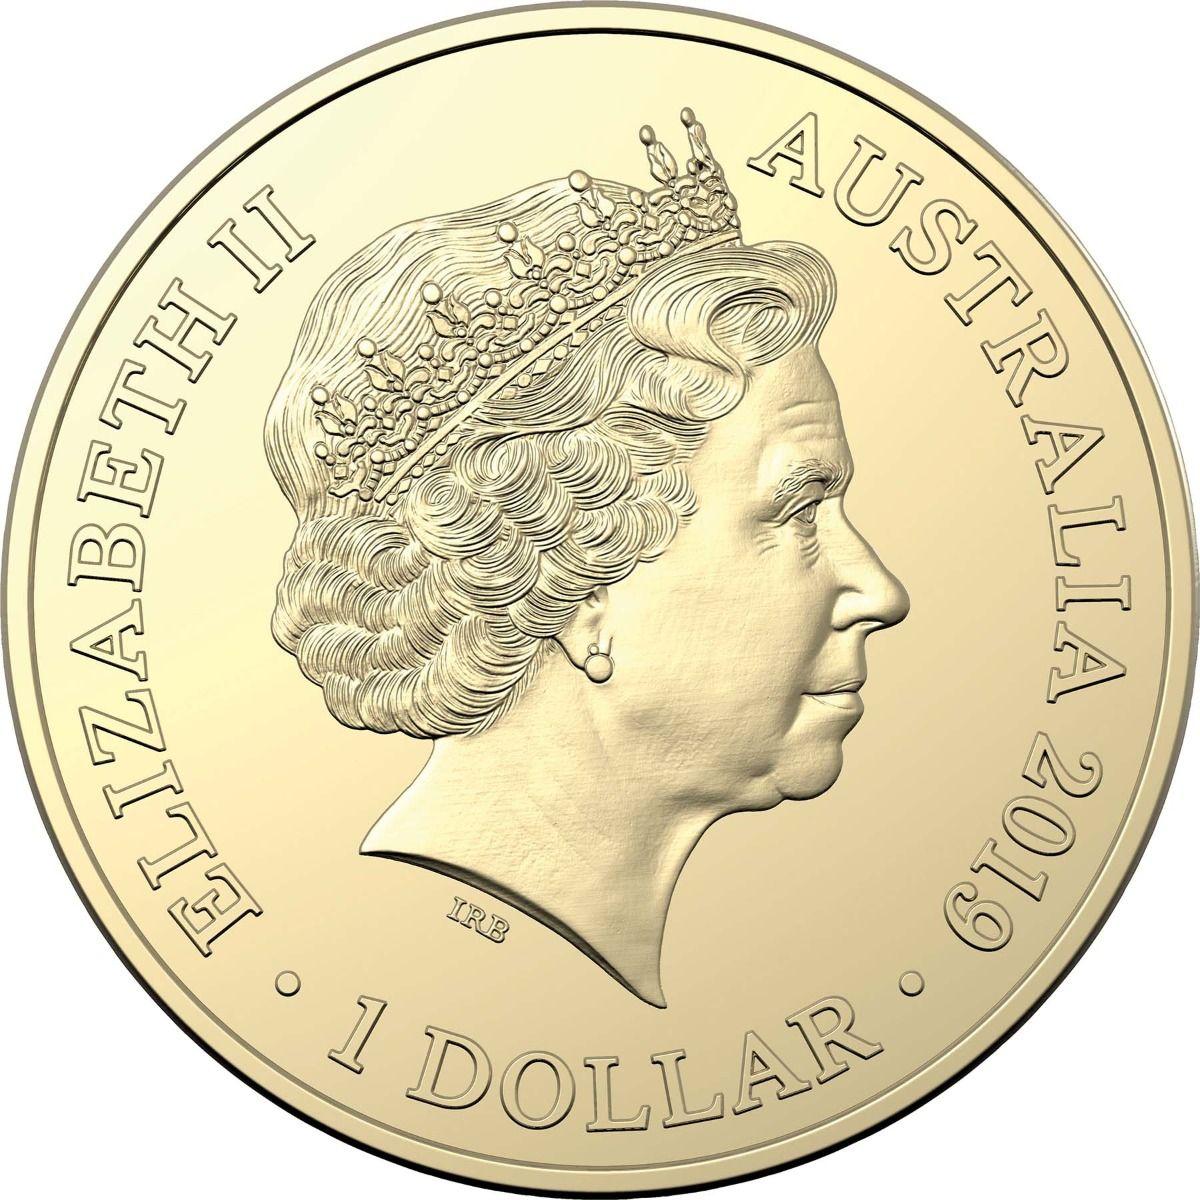 Coins Australia 2019 Icc Cricket World Cup 1 Al Br Uncirculated Coin